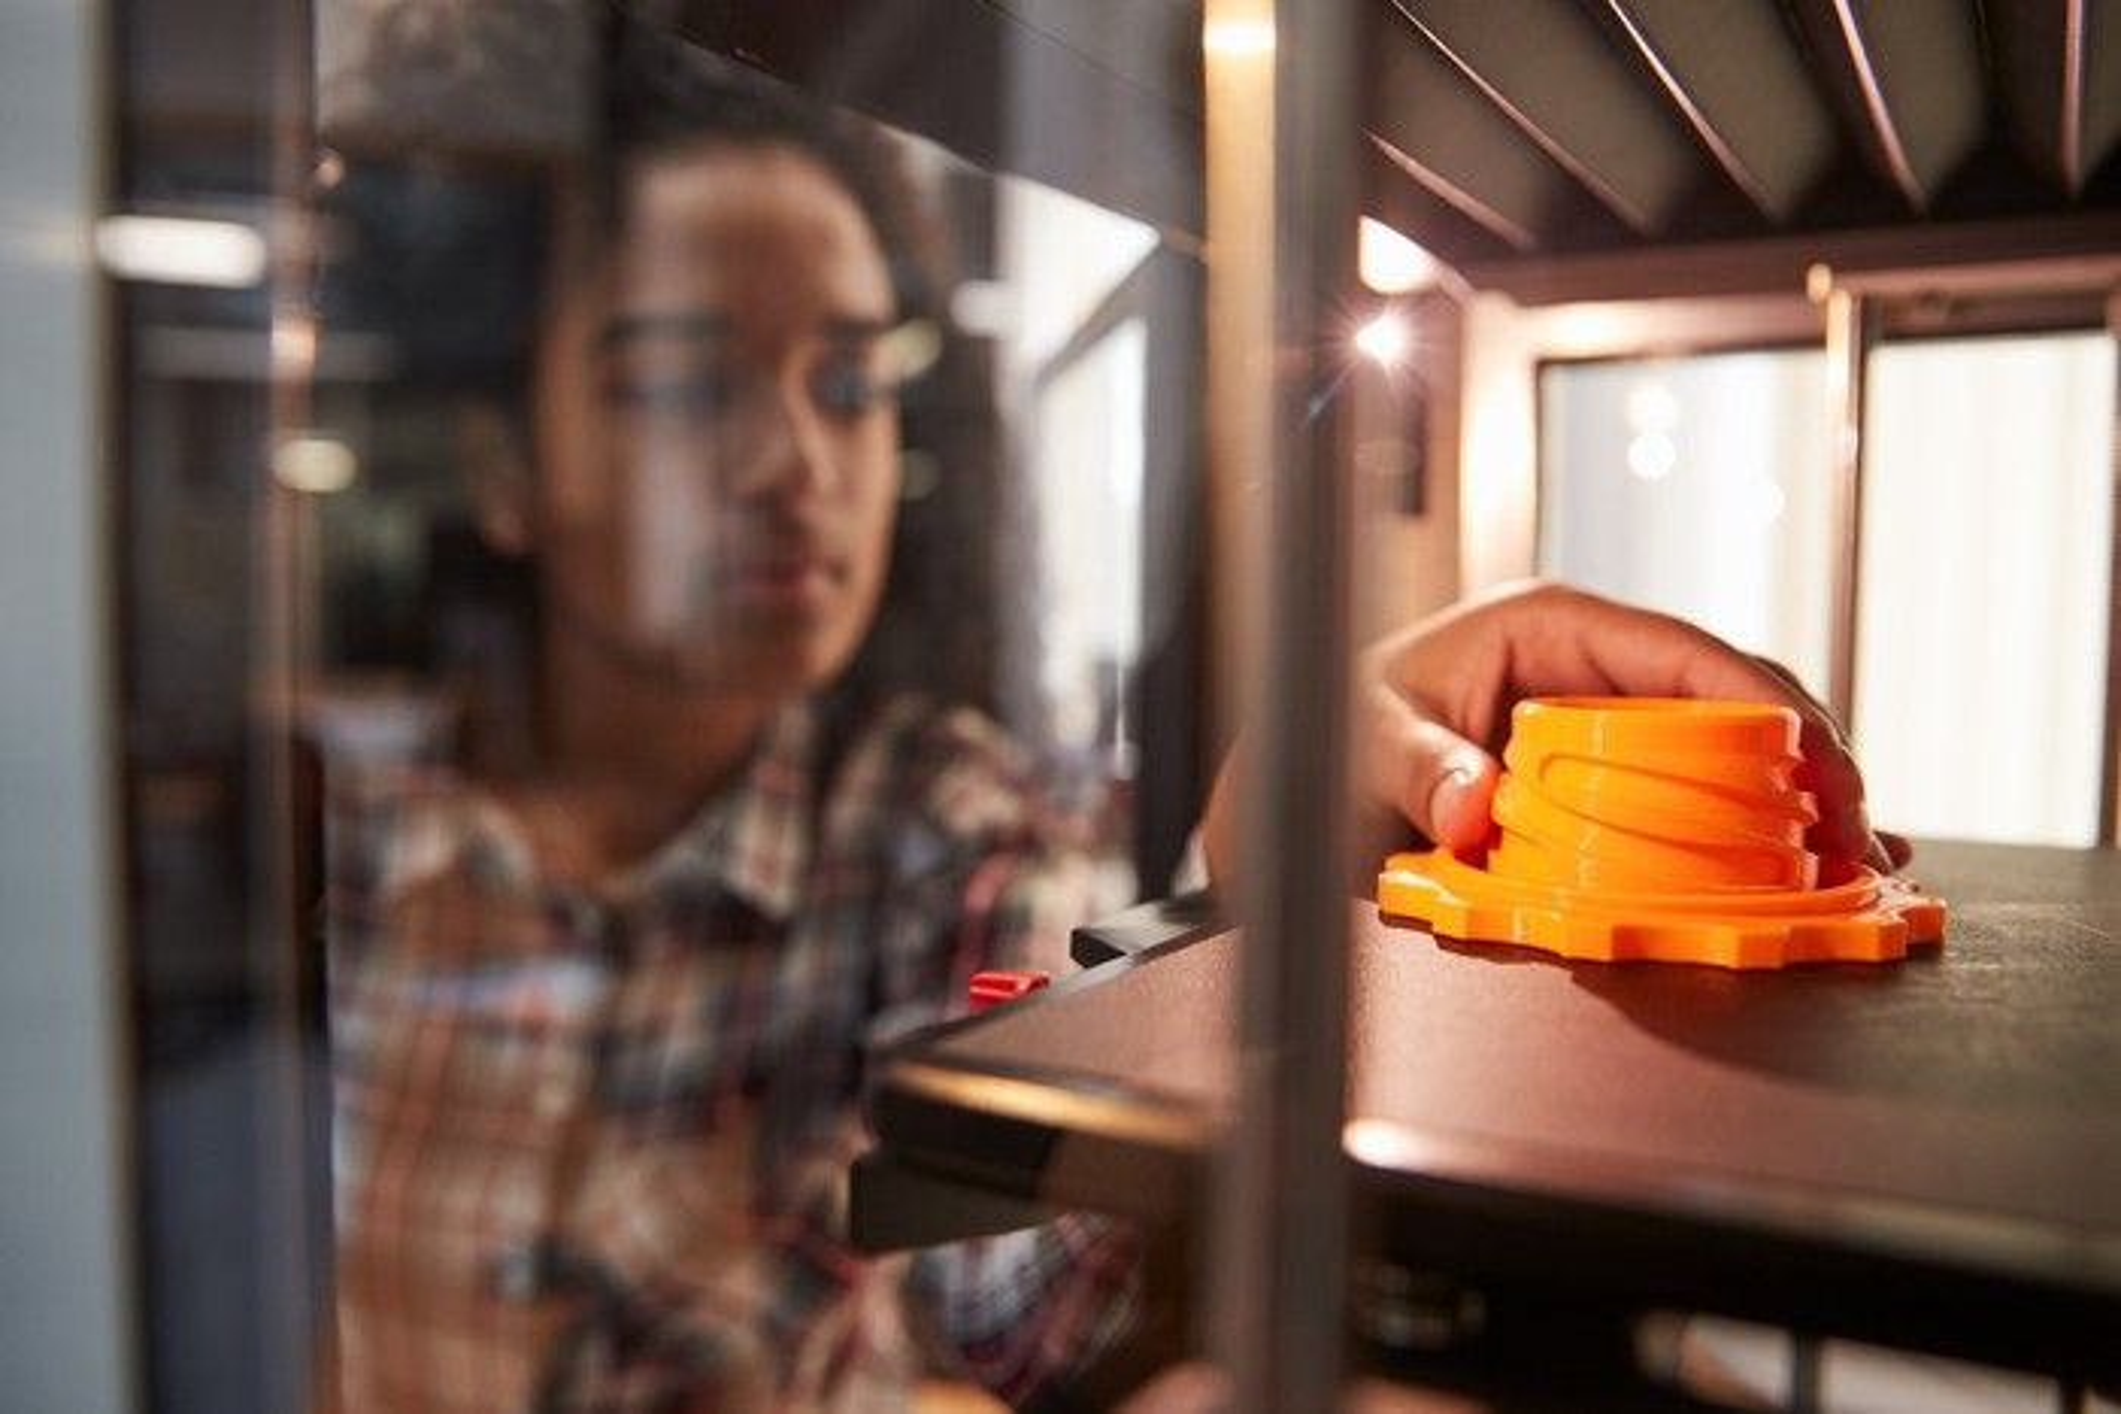 A person 3D printing an orange part.